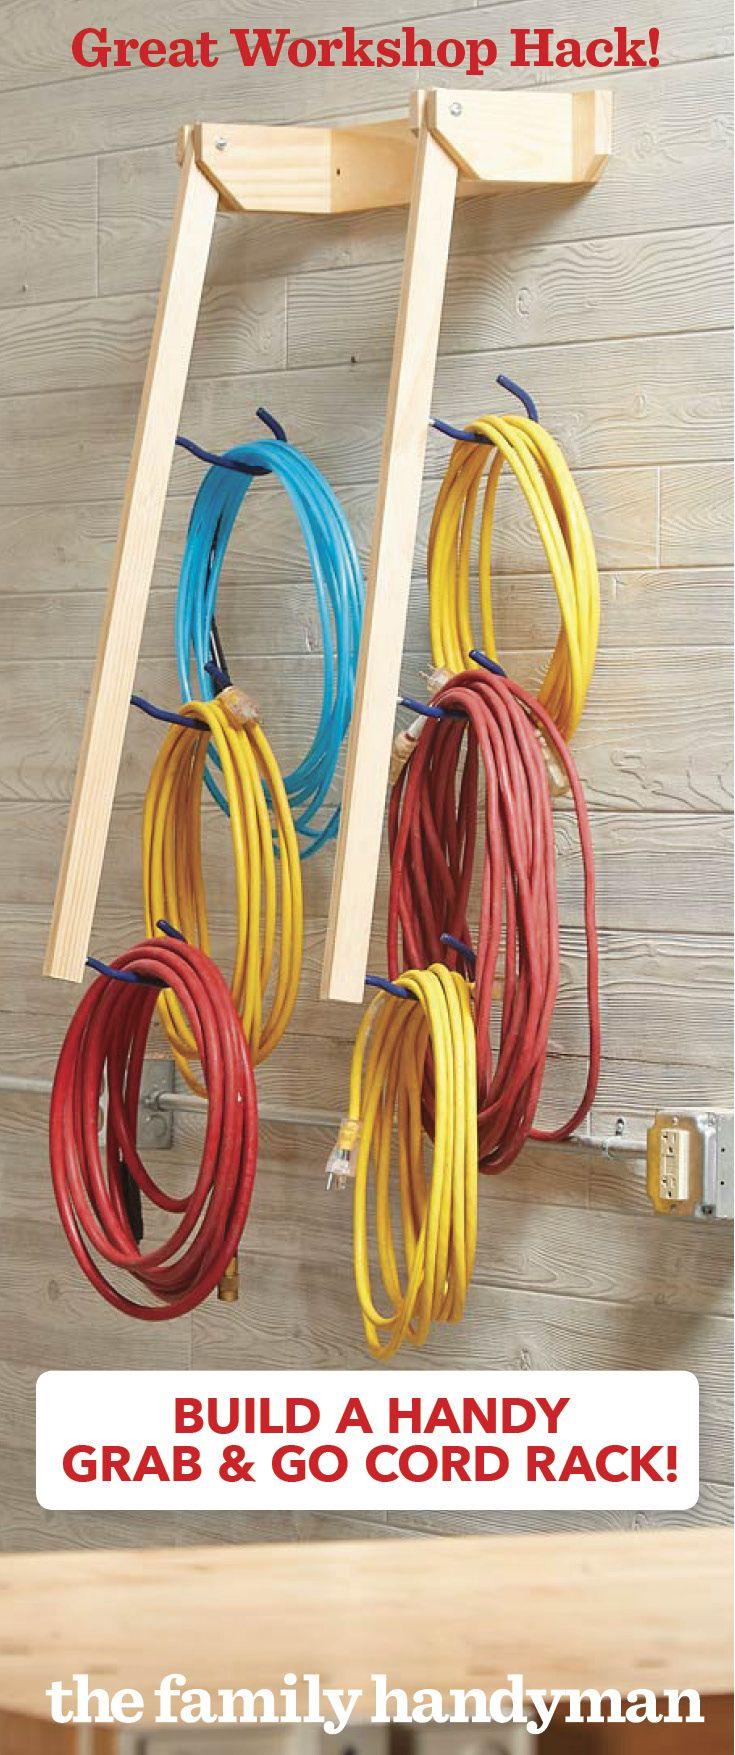 How To Build A Grab Go Cord Rack Garage Storage Garage Organization Garage Tools